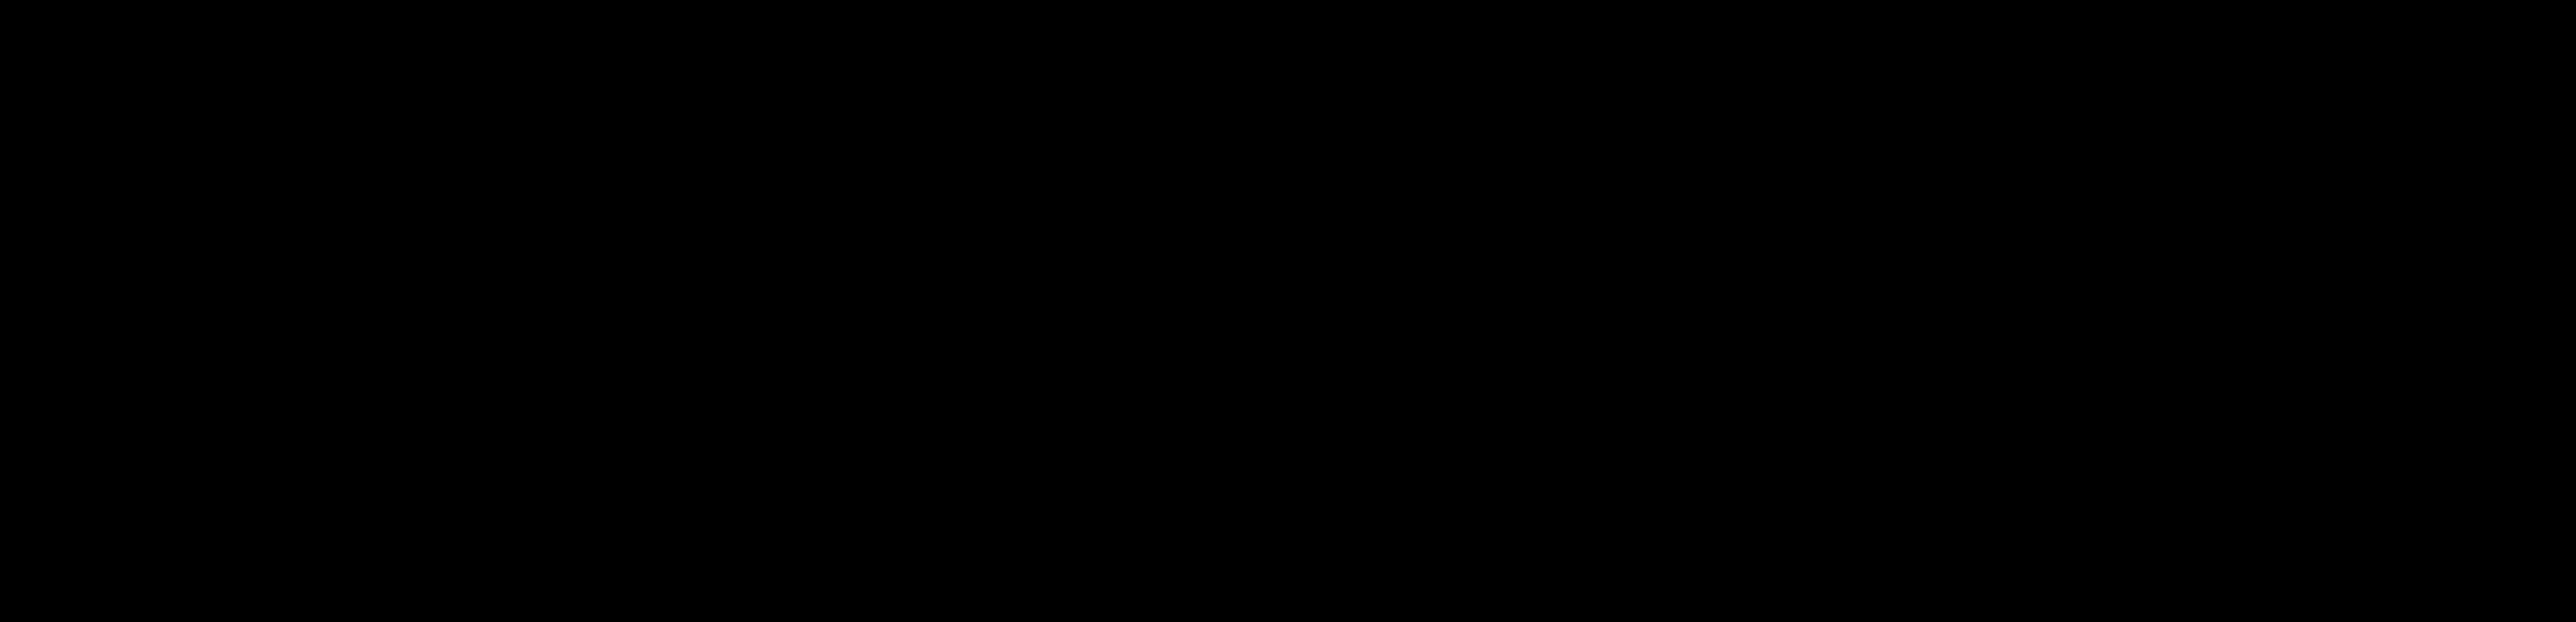 Di-O-Alaninoylcurcumin